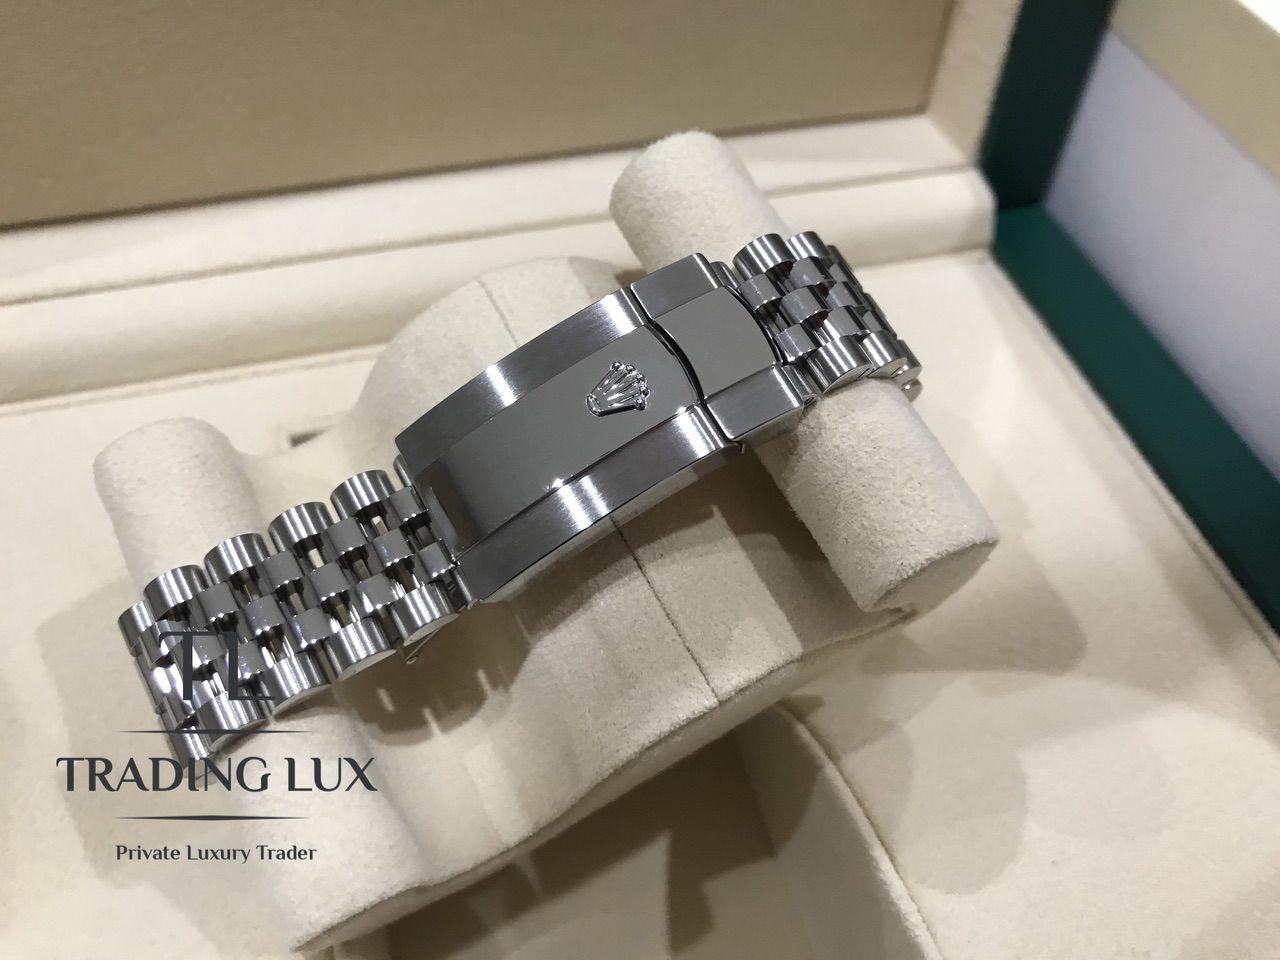 Rolex-Datejust-126234-6